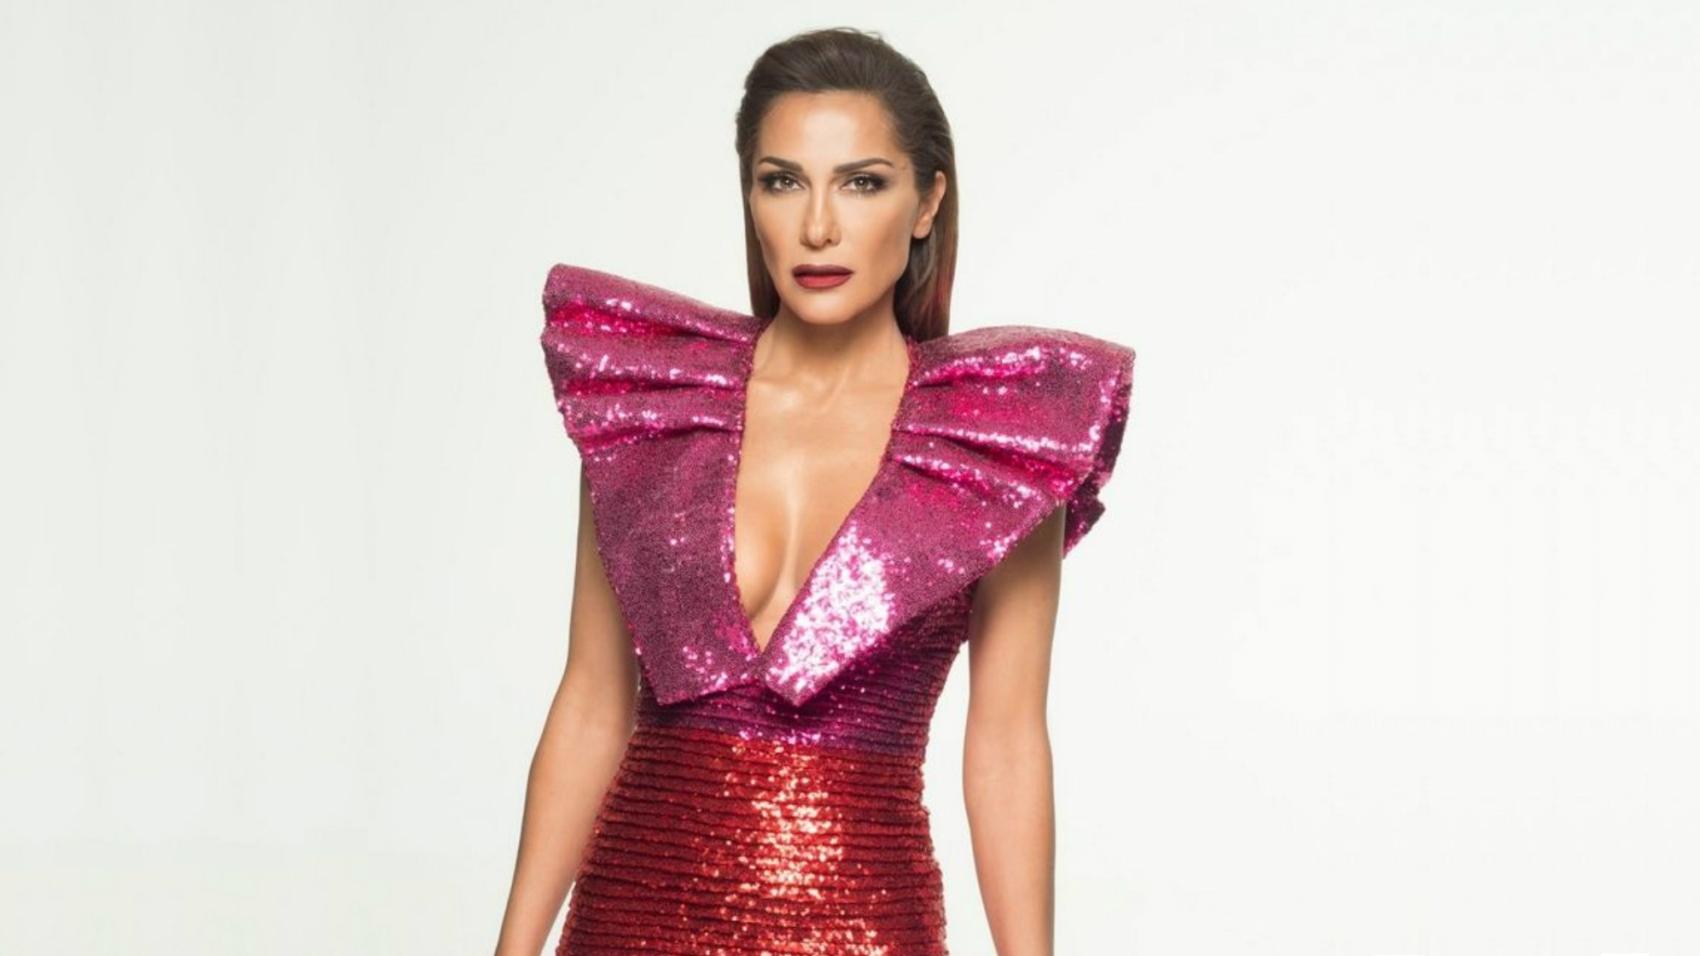 X Factor Ο τελικός ερχεται με πολλες εκπληξεις